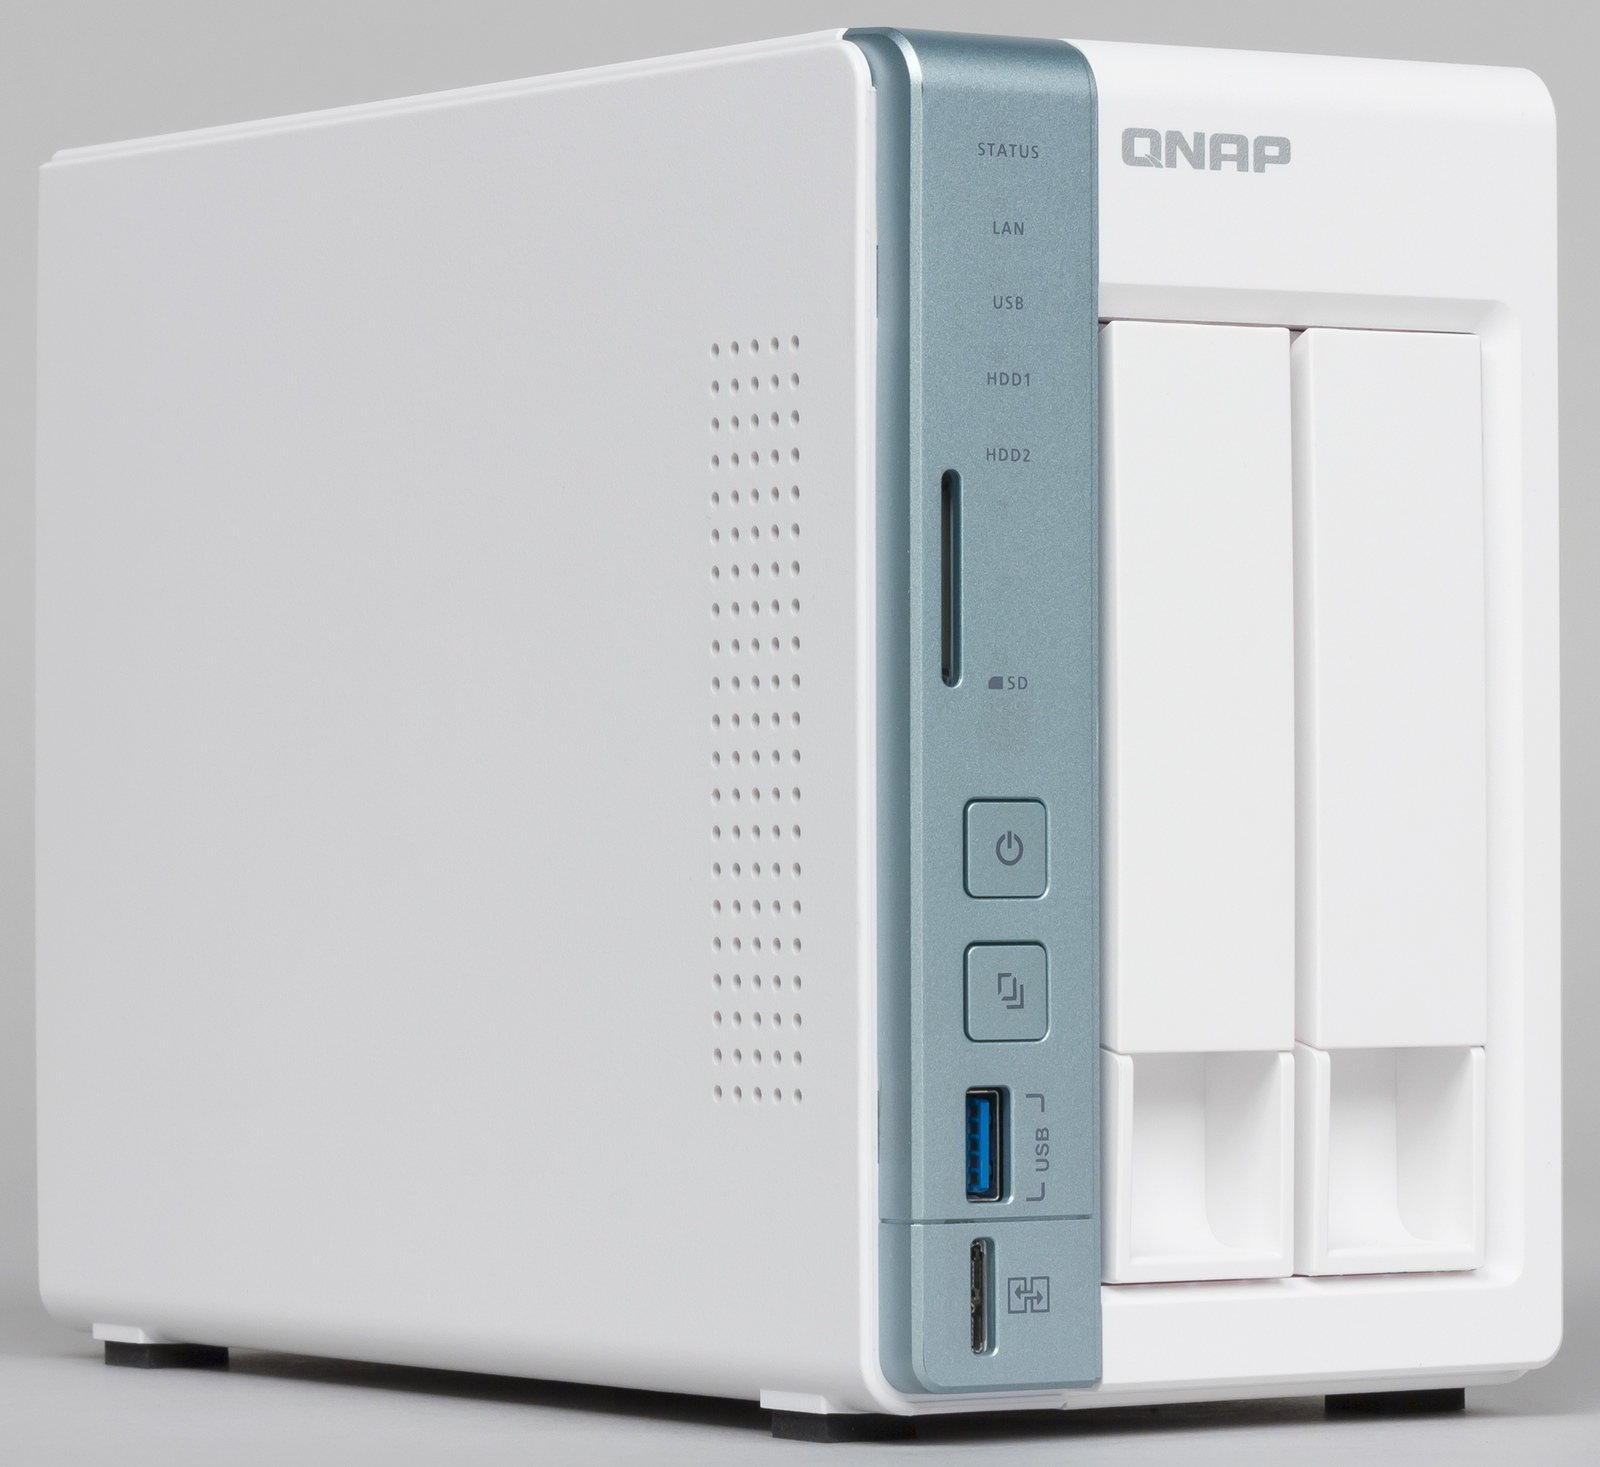 Обзор сетевых накопителей QNAP D2 Pro и D4 Pro на платформе x86